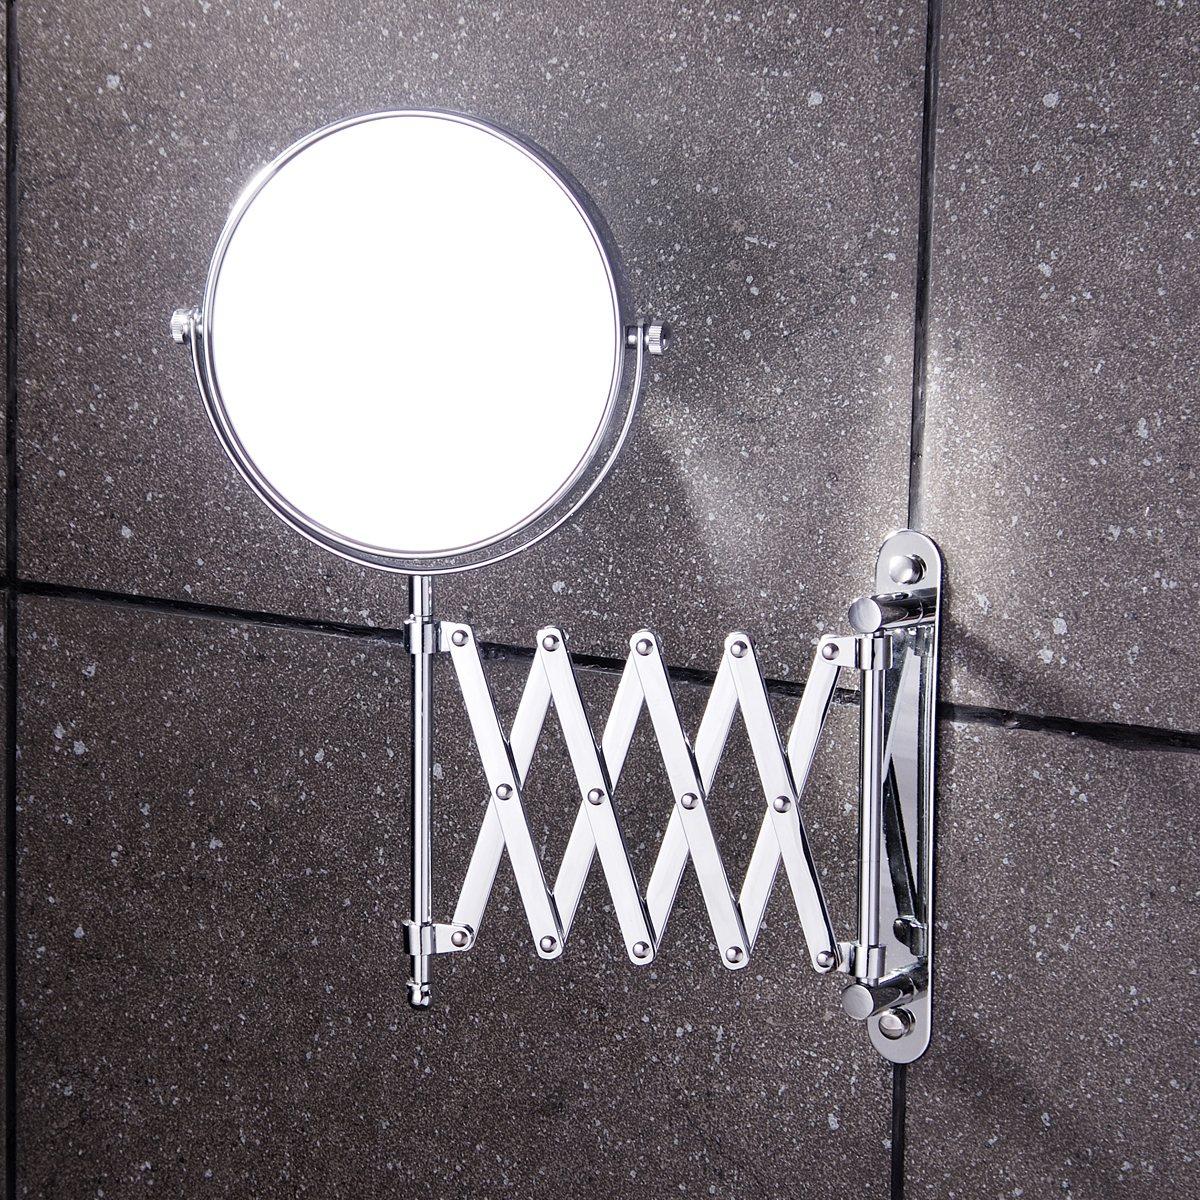 8 inch Bathroom makeup mirror brass bathroom double faced makeup mirror magnifier X3 beauty mirror retractable wall mirror<br><br>Aliexpress